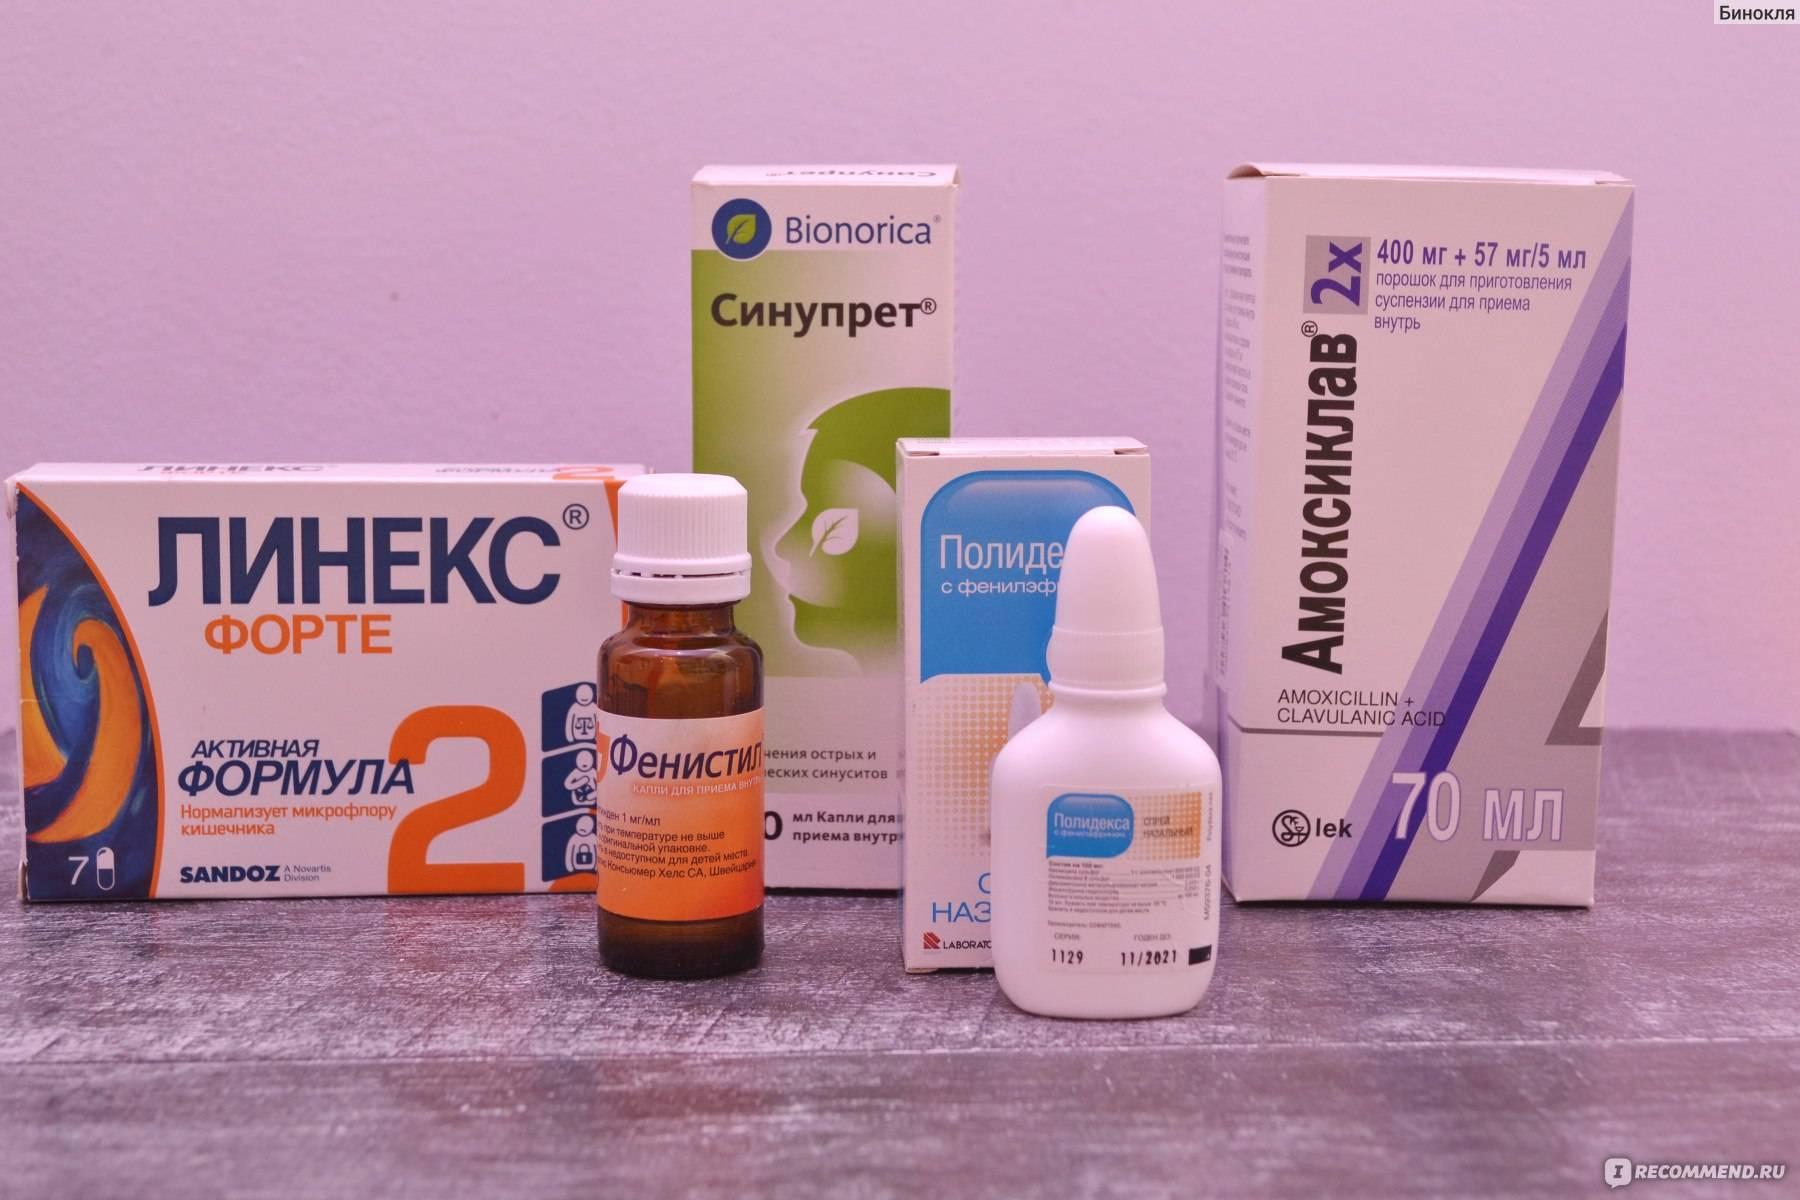 Уколы антибиотиками при гайморите — описание, рекомендации, противопоказания